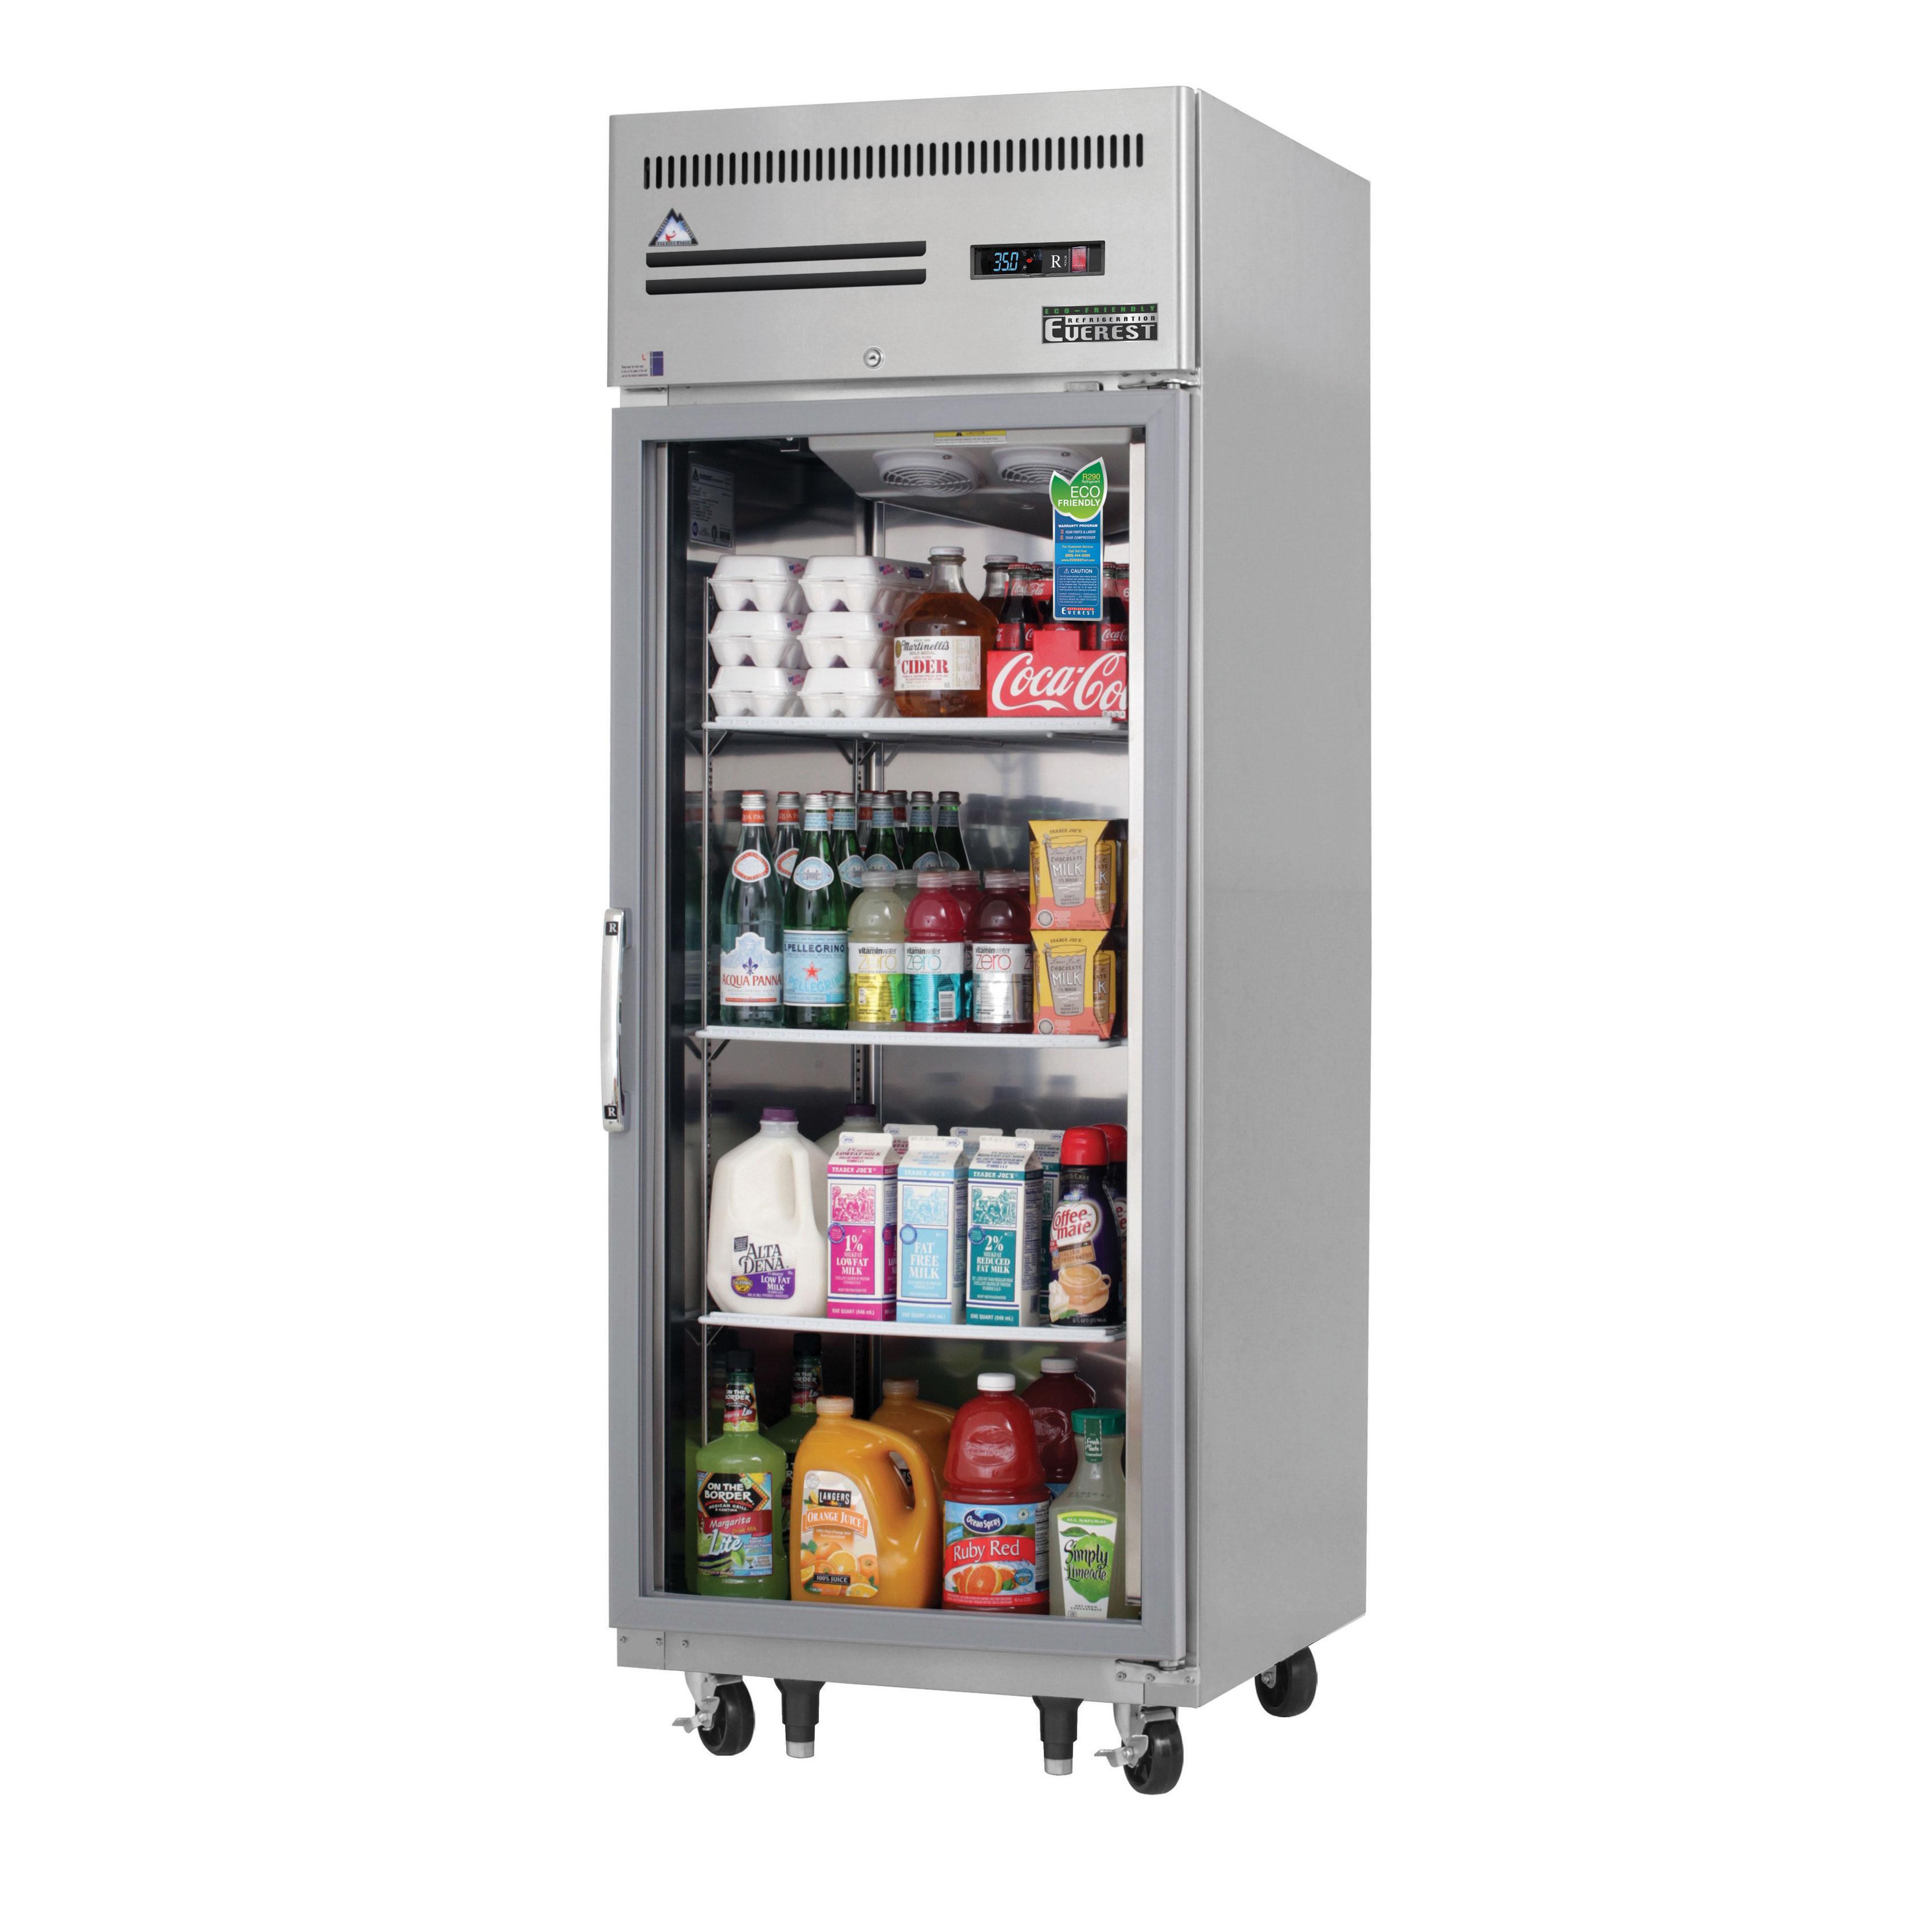 Everest Refrigeration ESGR1 refrigerator, reach-in